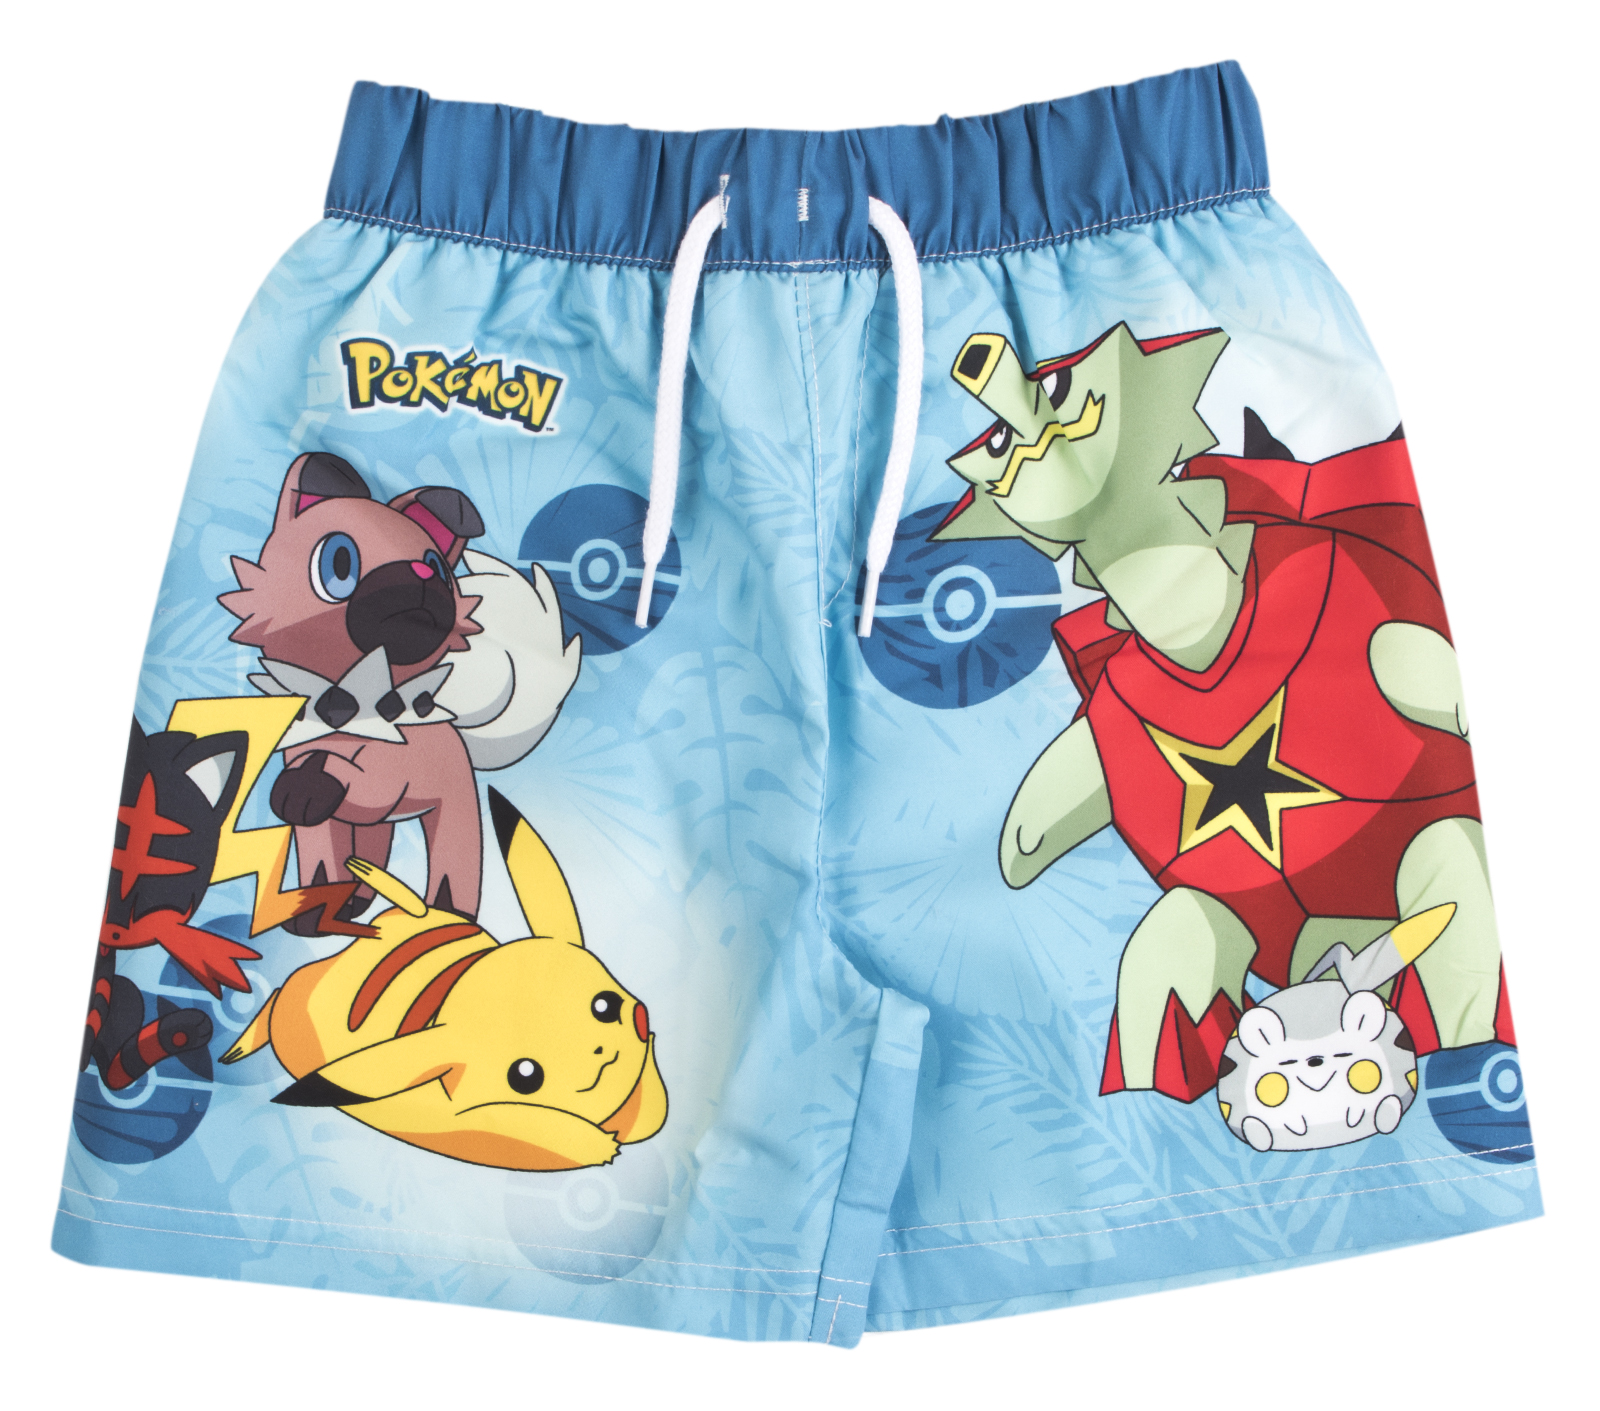 b66a941b35 Pokemon Swim Shorts Pikachu Summer Board Swimming Shorts Trunks Swimwear  Size